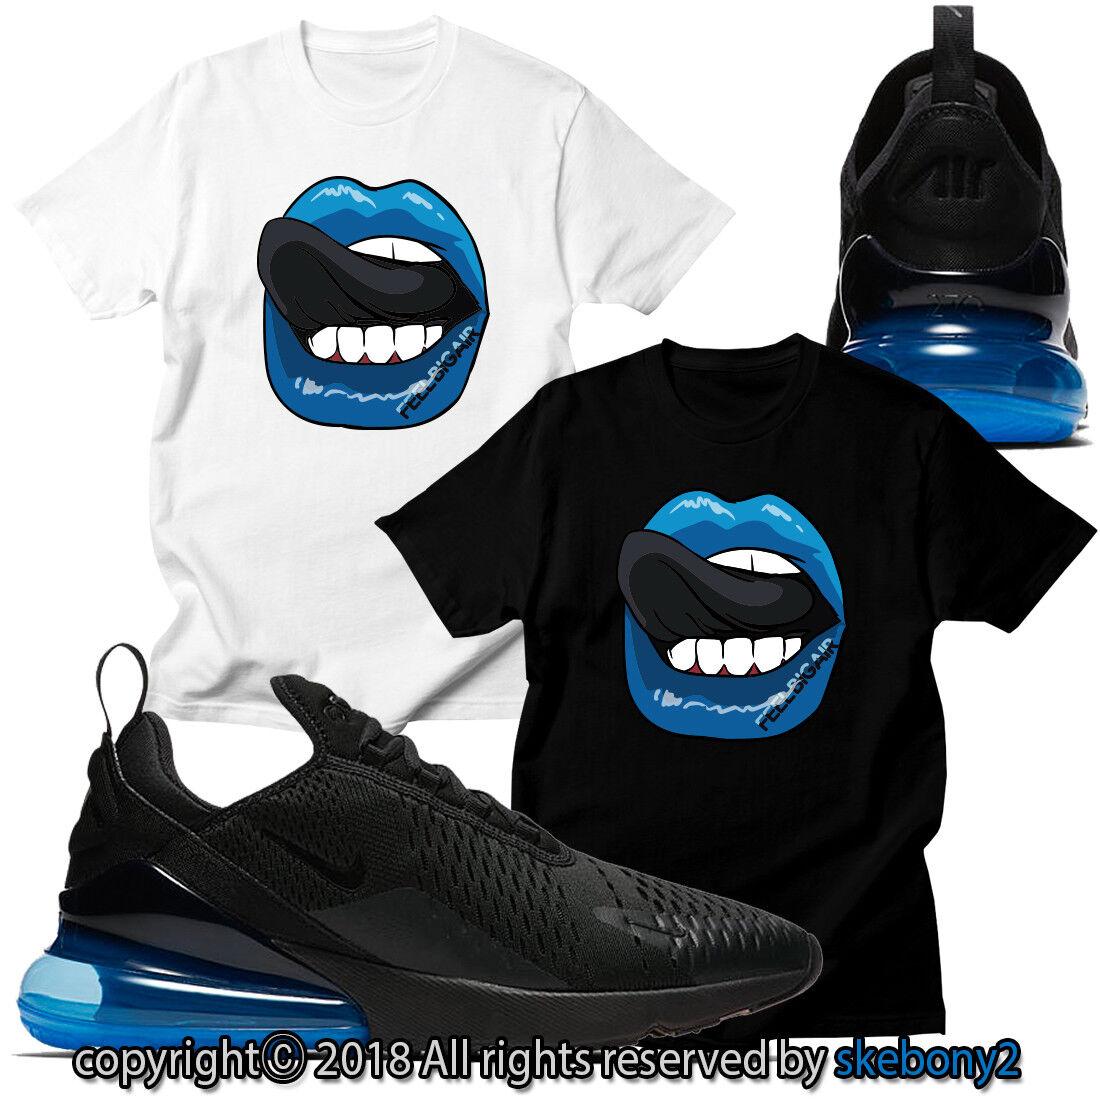 NY TYGGANDE T-SHIRT som matchar Nike Air Max 270 BLACK PHOTO BLUE AM270 1-9-4